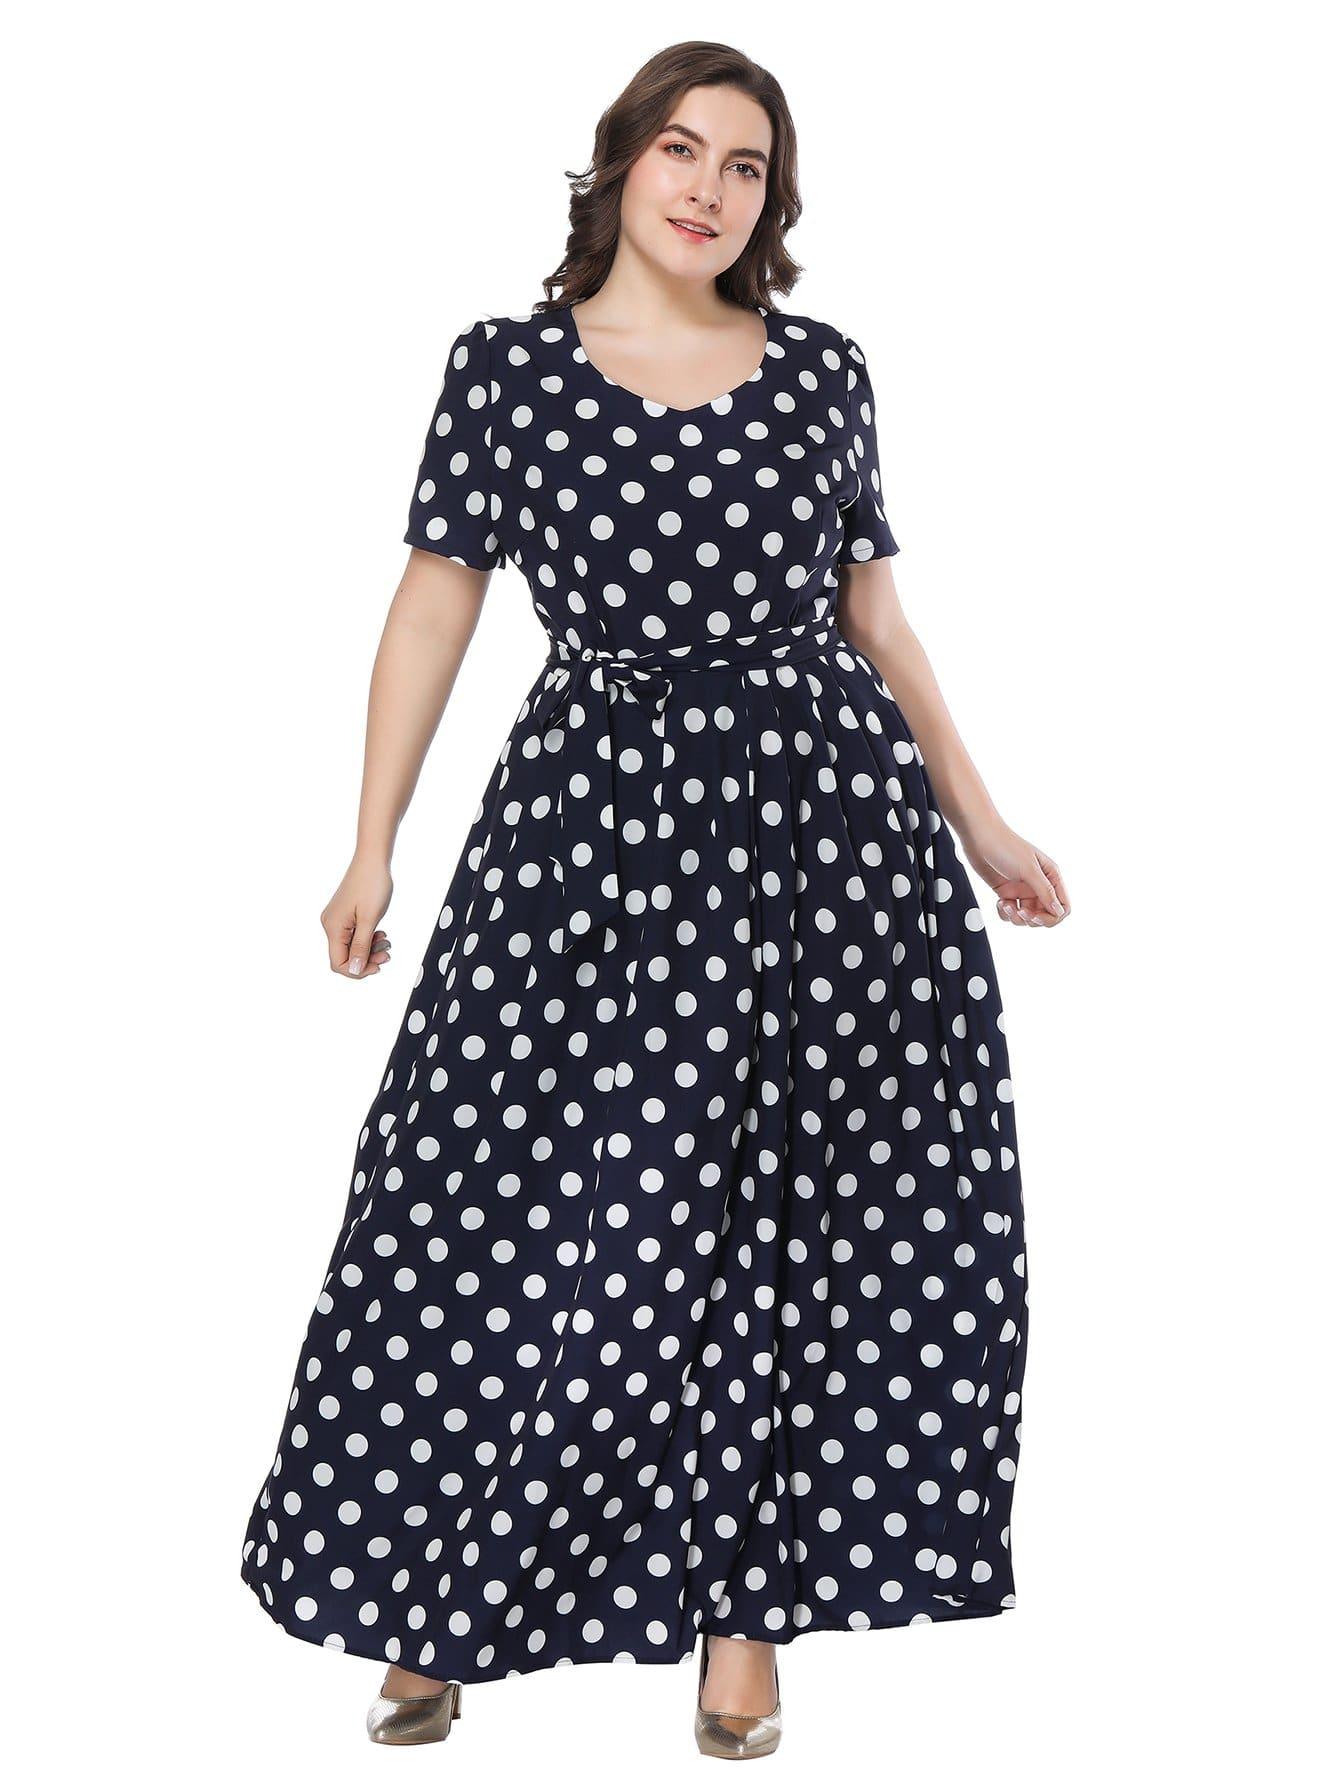 Plus Polka Dot Self Tie Waist Dress